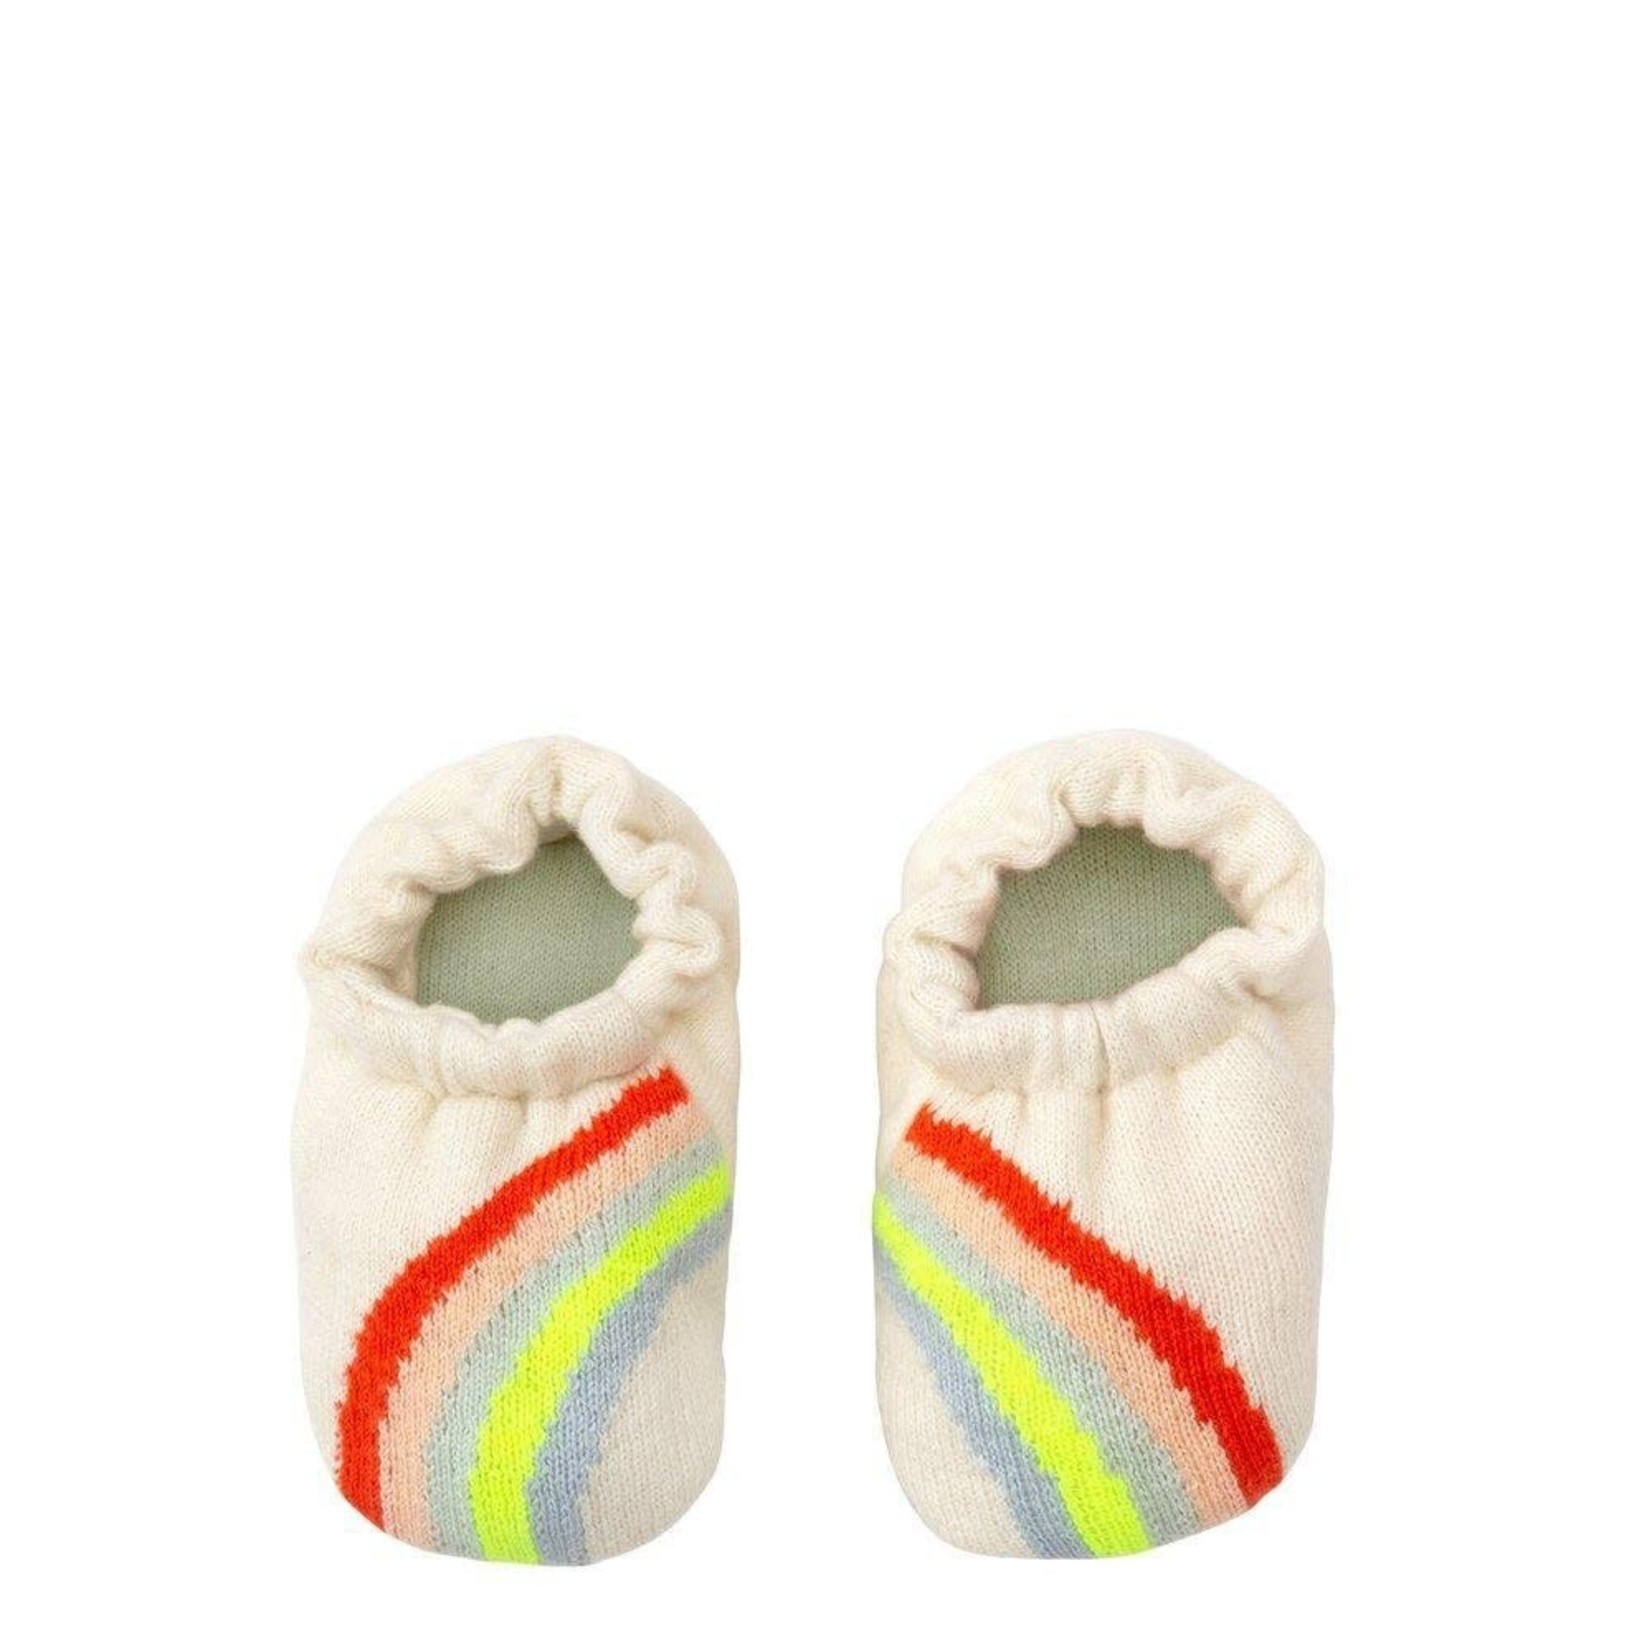 Meri Meri Knit Booties